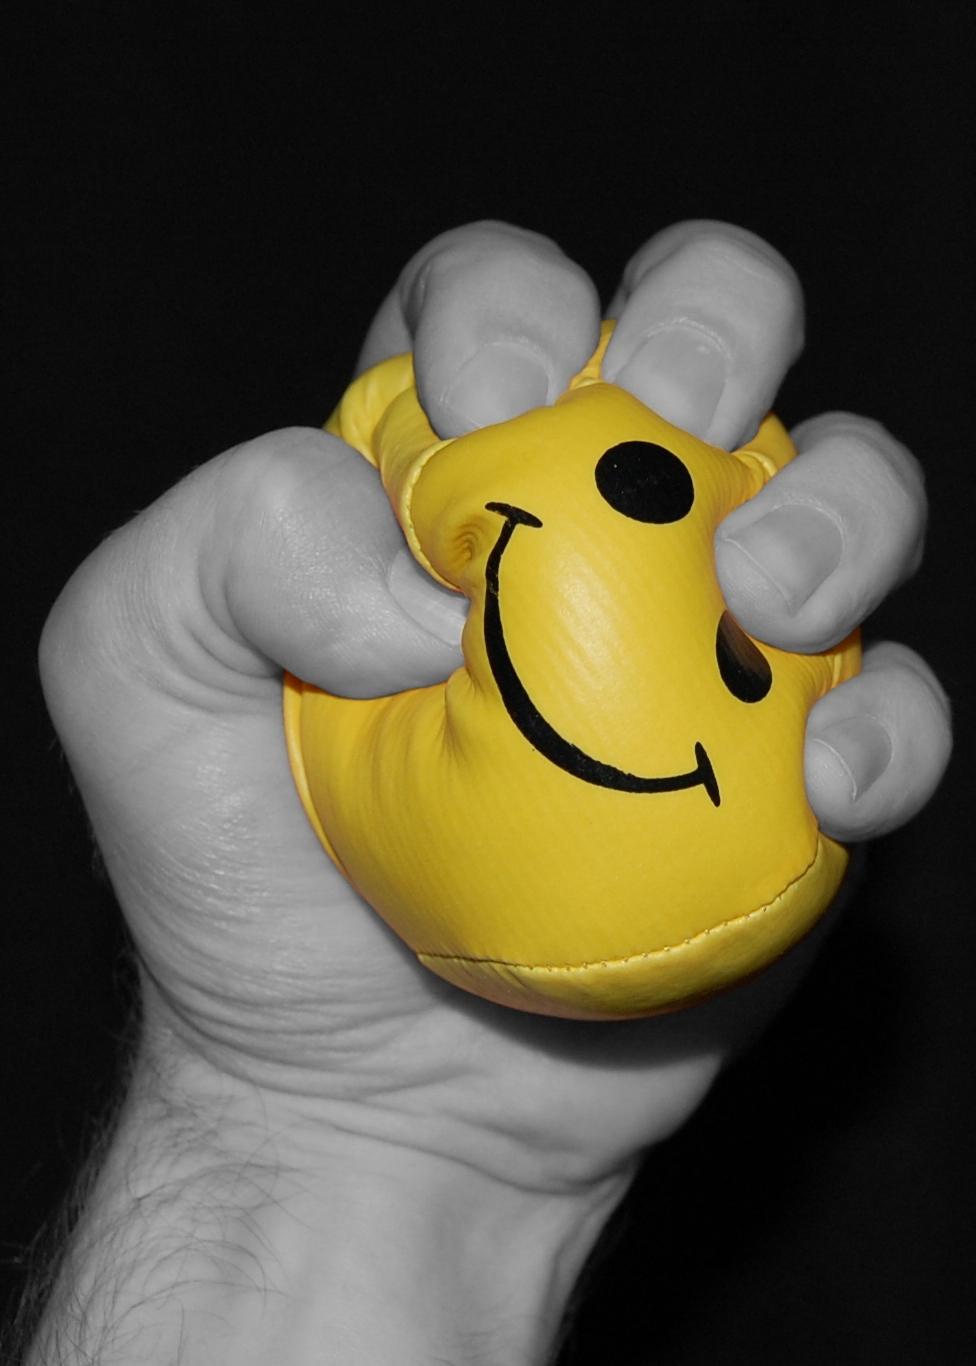 Managing stress reduces adrenal fatigue